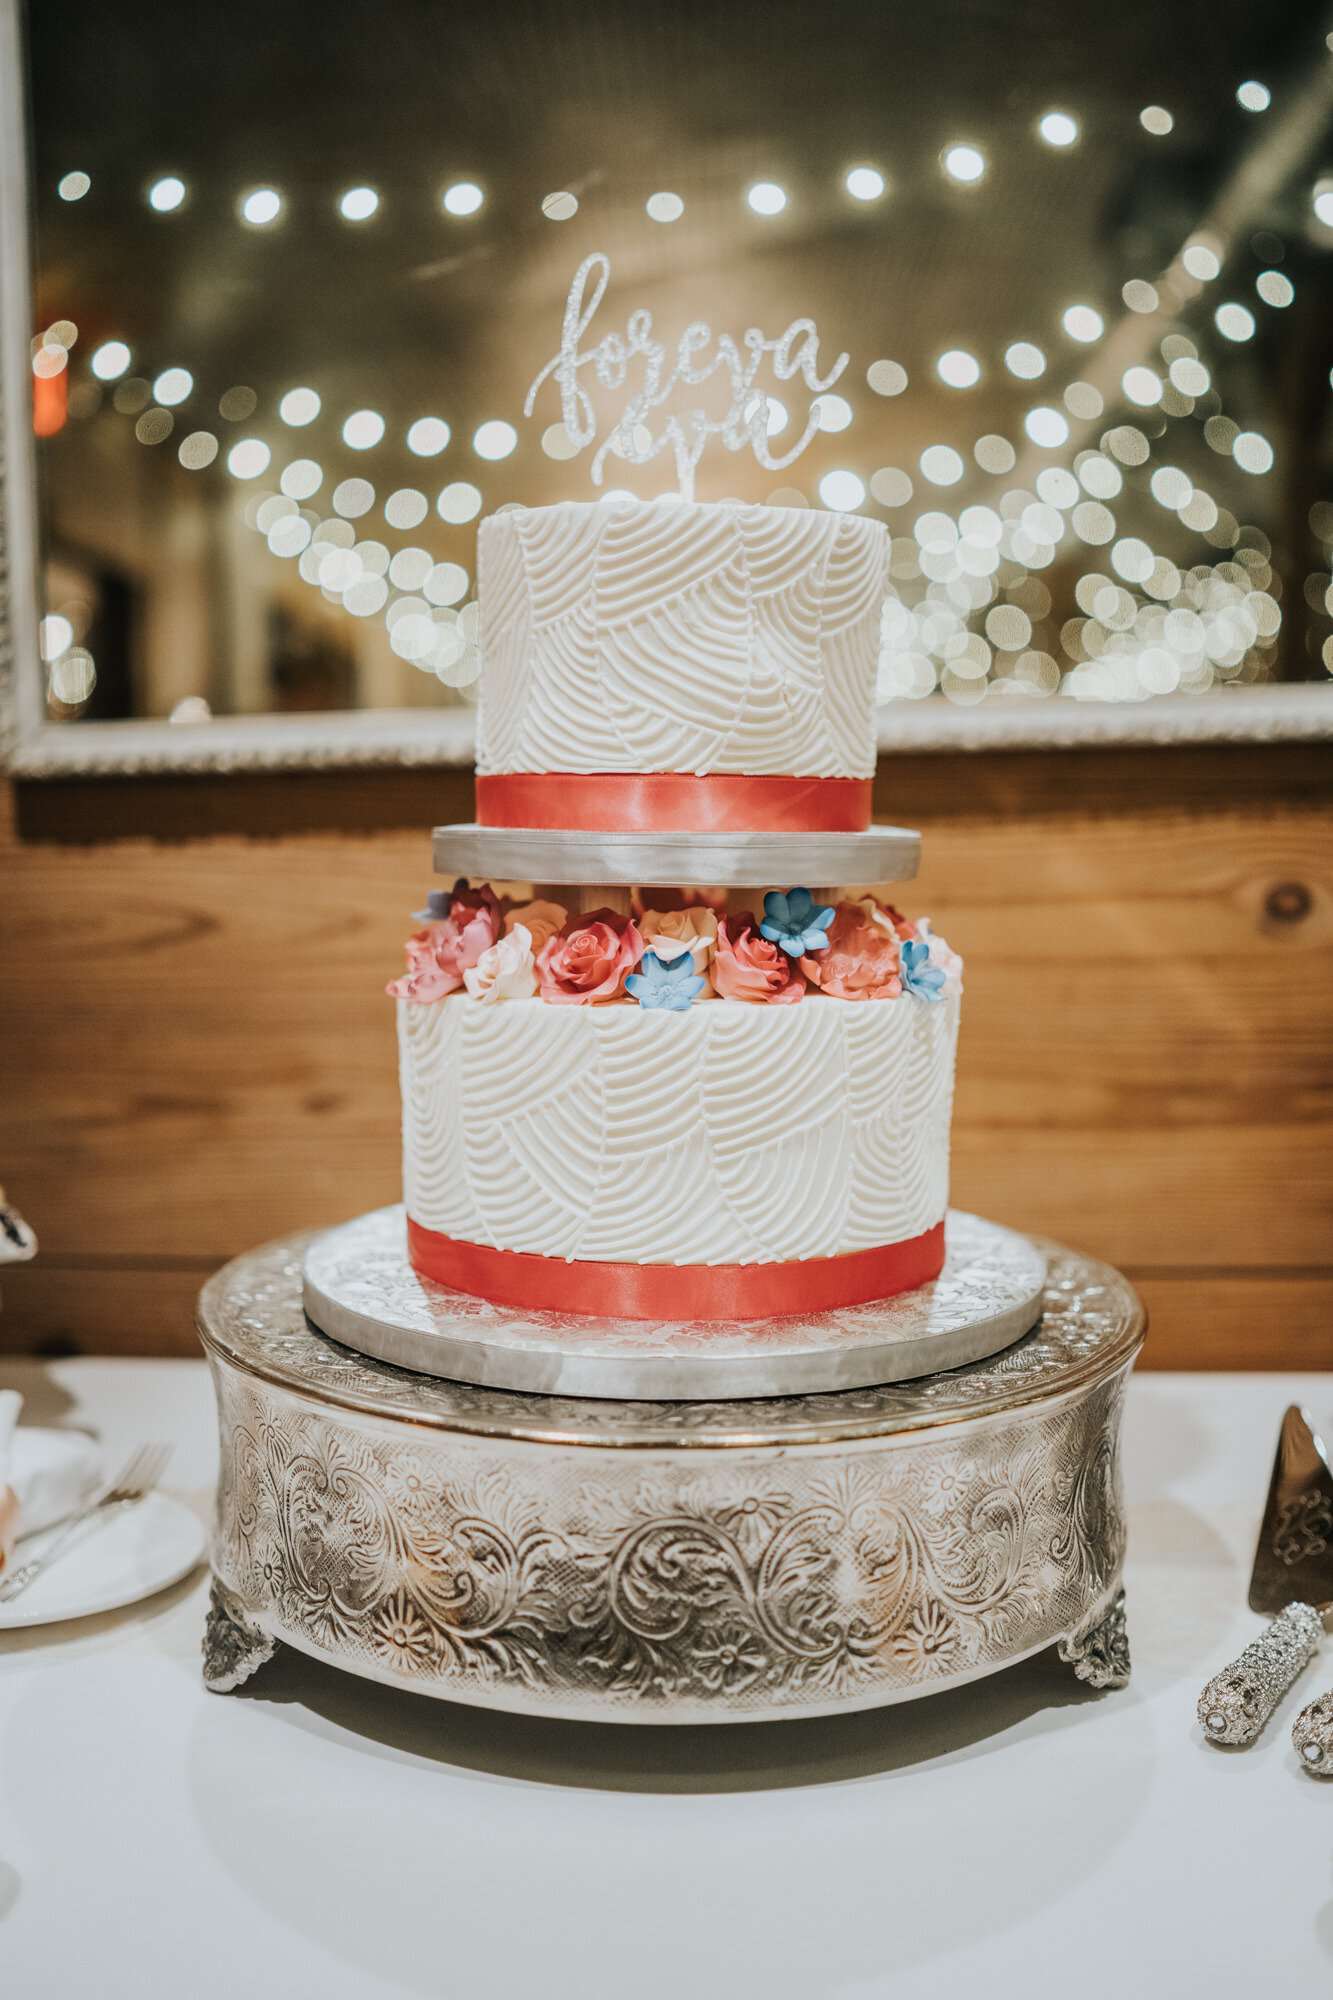 481Sean_Emily_Wedding_3-30-19.jpg